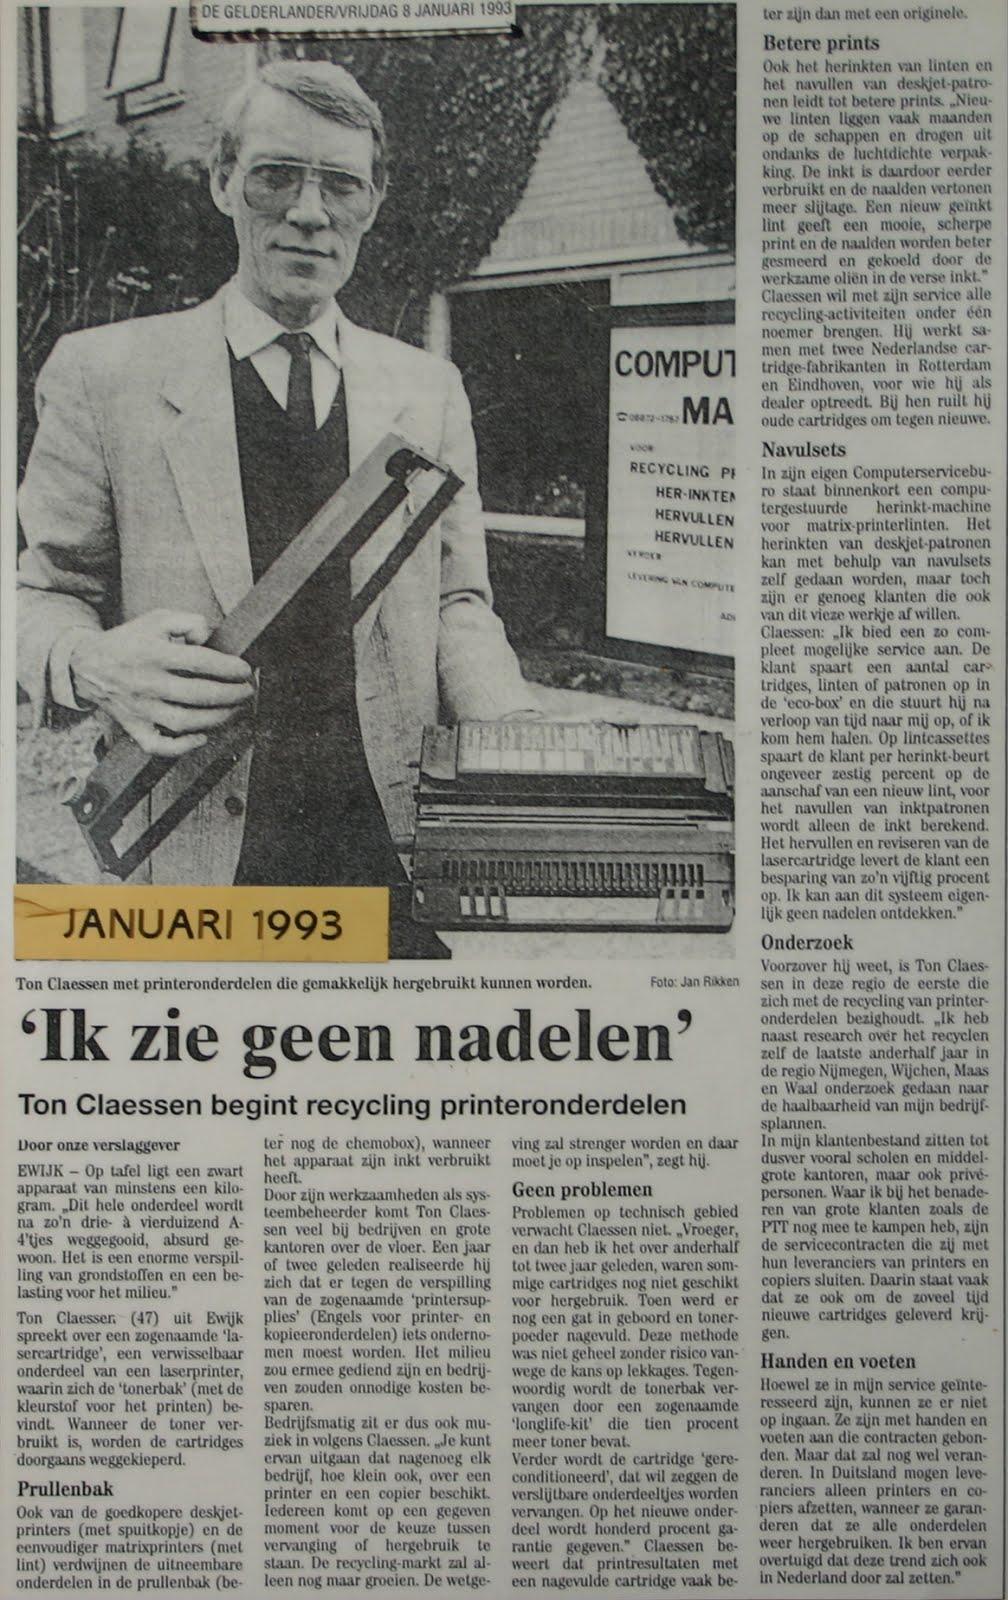 Artikel Gelderlander, 8-1-1993.